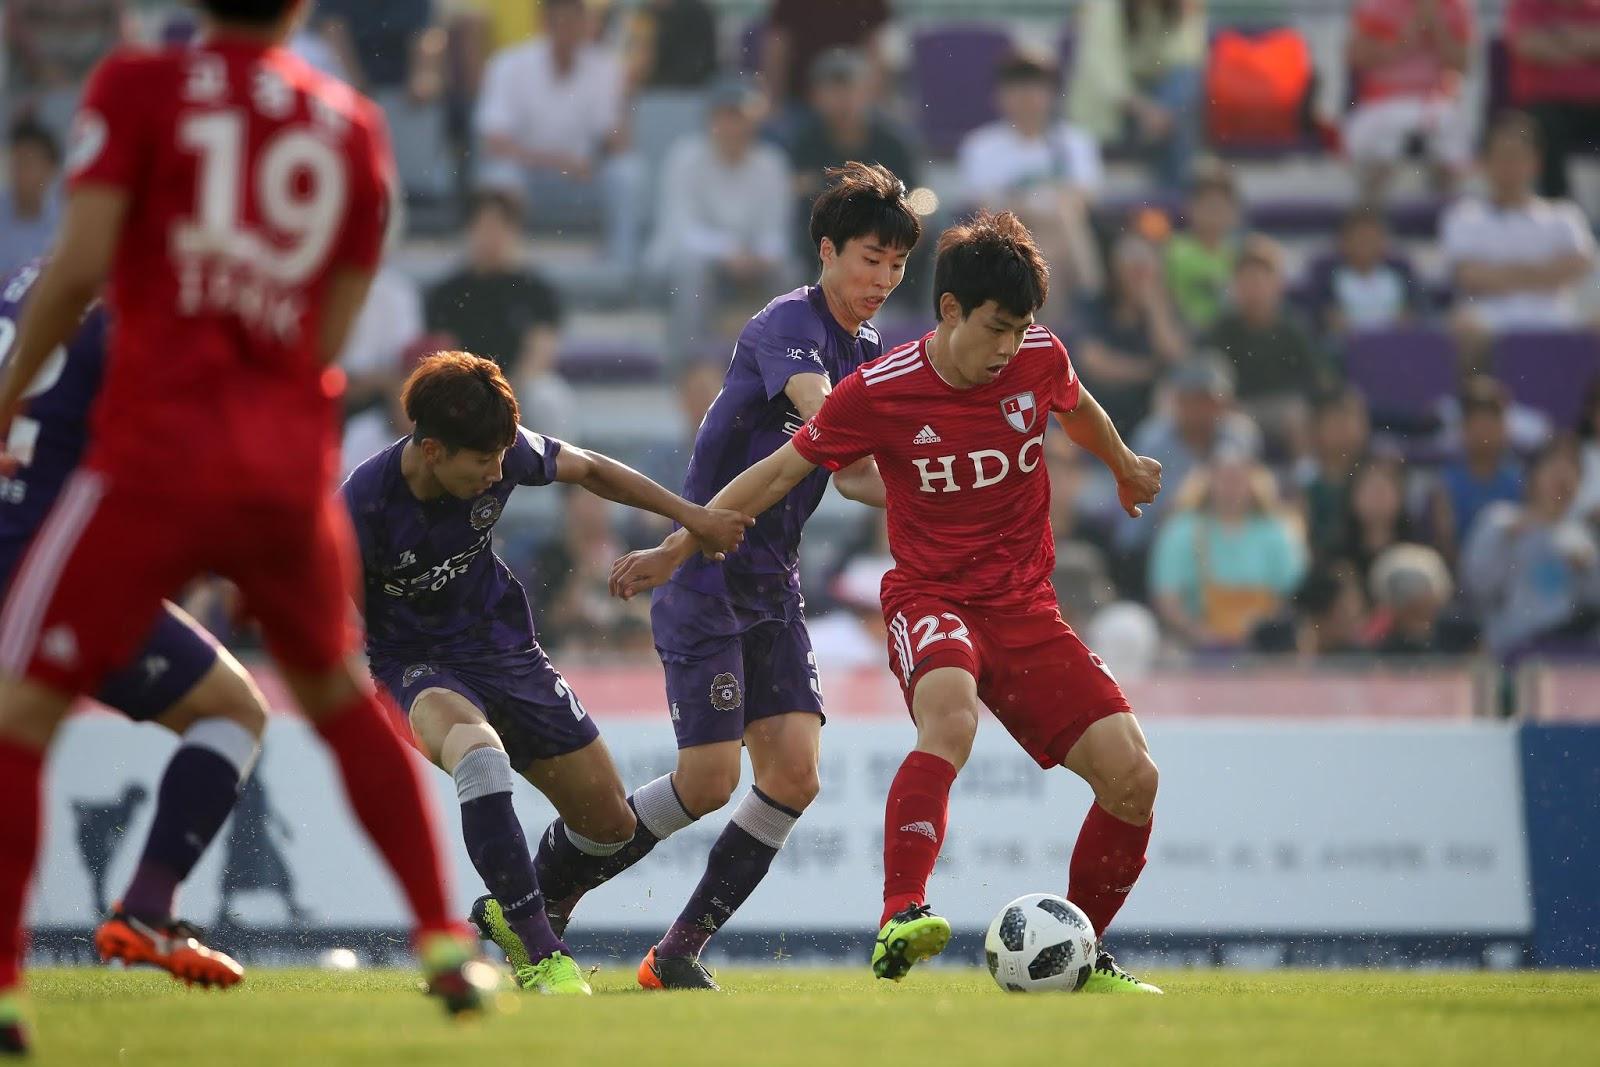 K League 2 Preview: Busan IPark vs FC Anyang